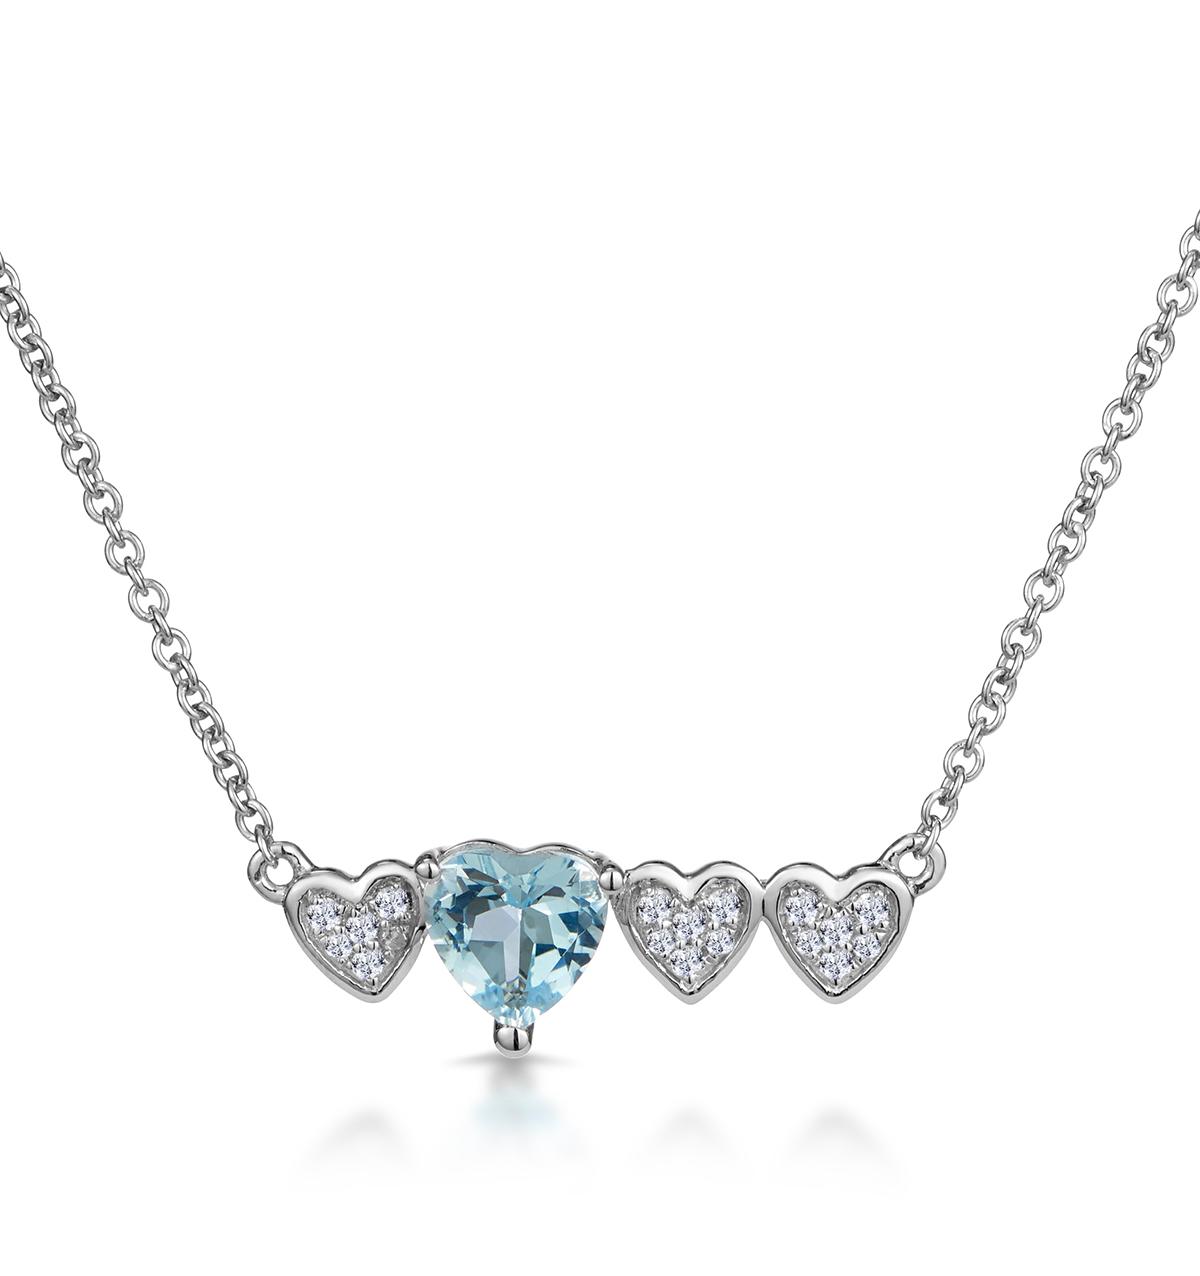 AQUAMARINE AND DIAMOND STELLATO HEART NECKLACE IN 9K WHITE GOLD